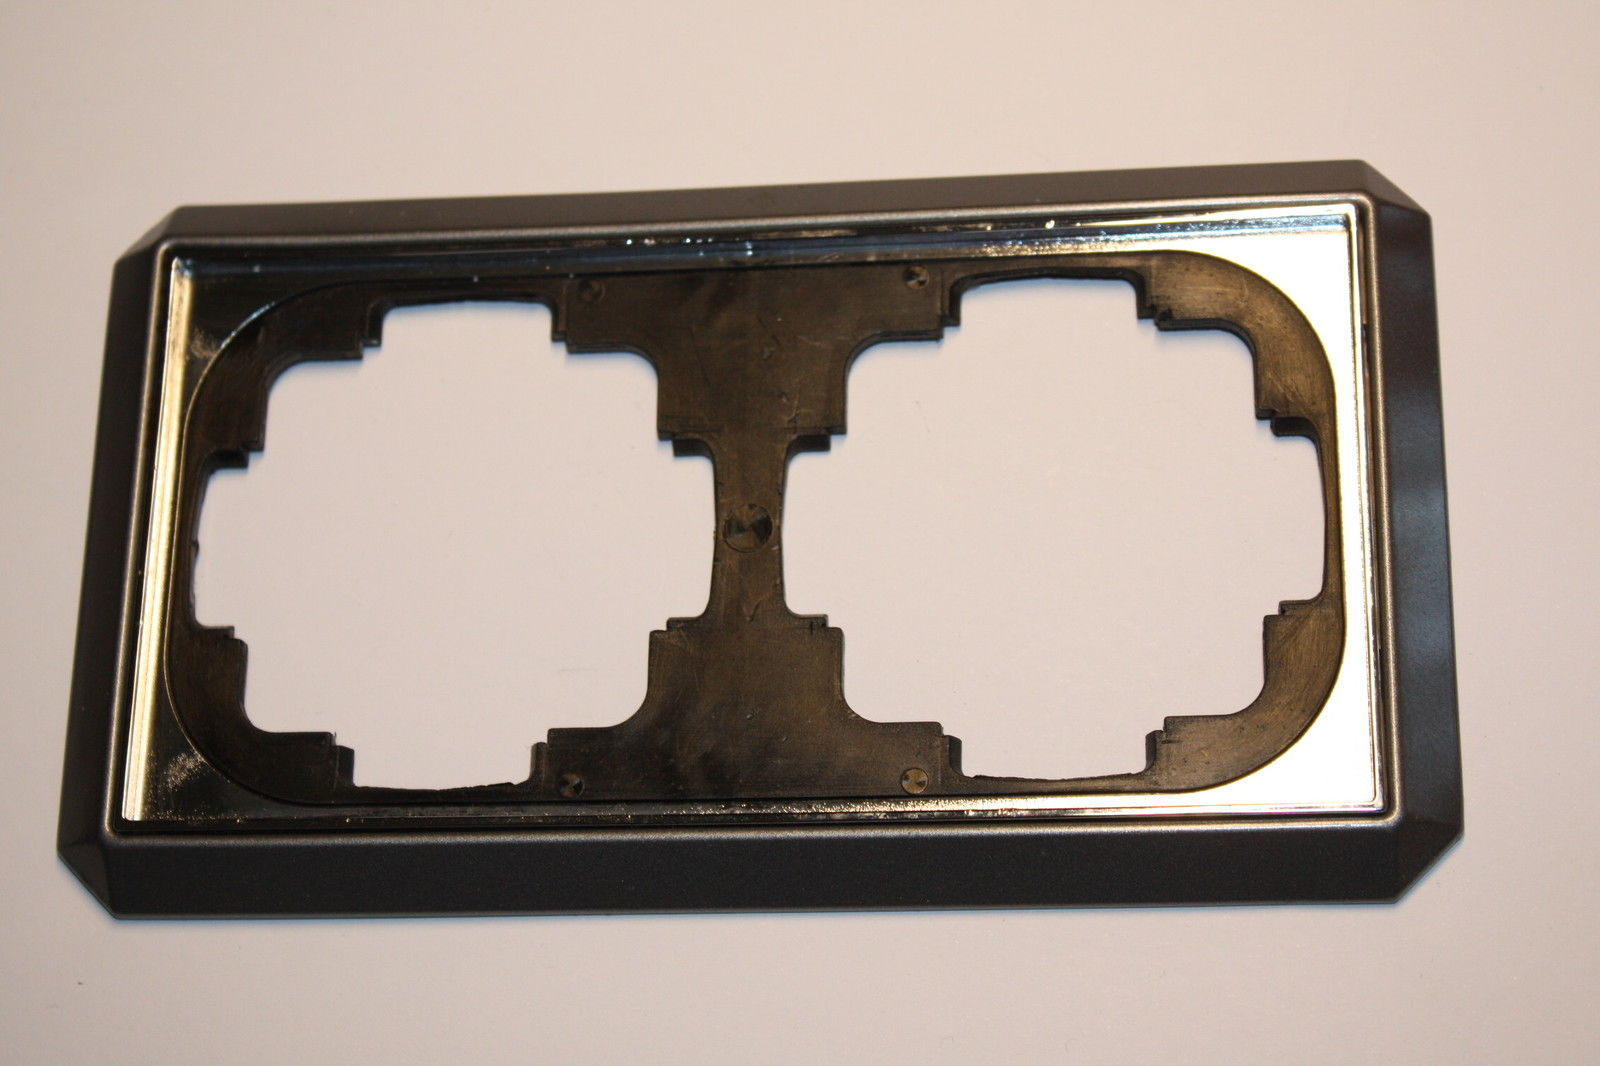 grau metallic der shop f r gebrauchtes schaltermaterial. Black Bedroom Furniture Sets. Home Design Ideas